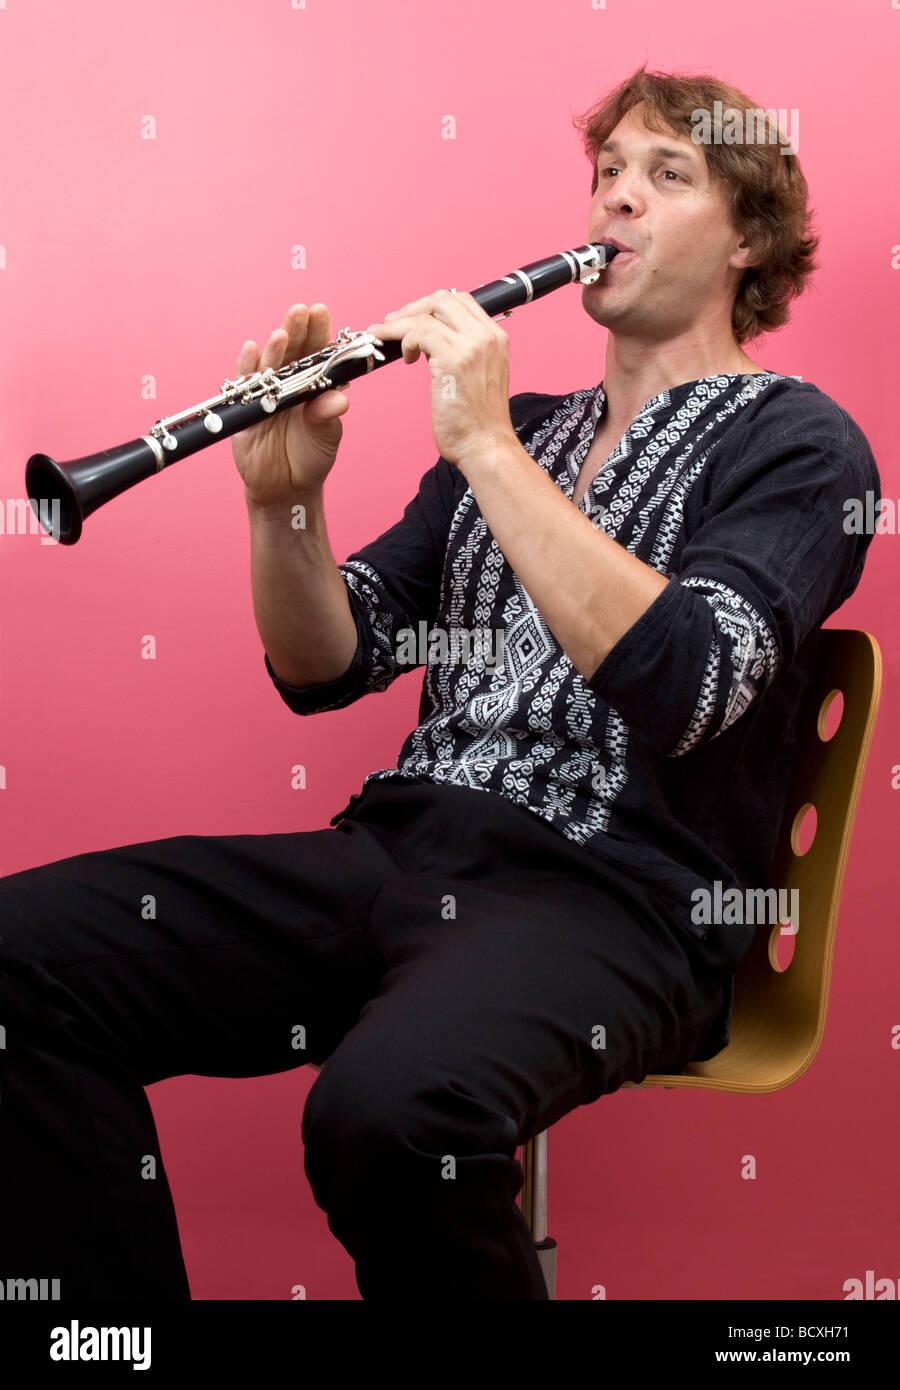 A photograph of Joël JORDA clarinettist playing his instrument. Portrait du clarinettiste Joël JORDA jouant - Stock Image